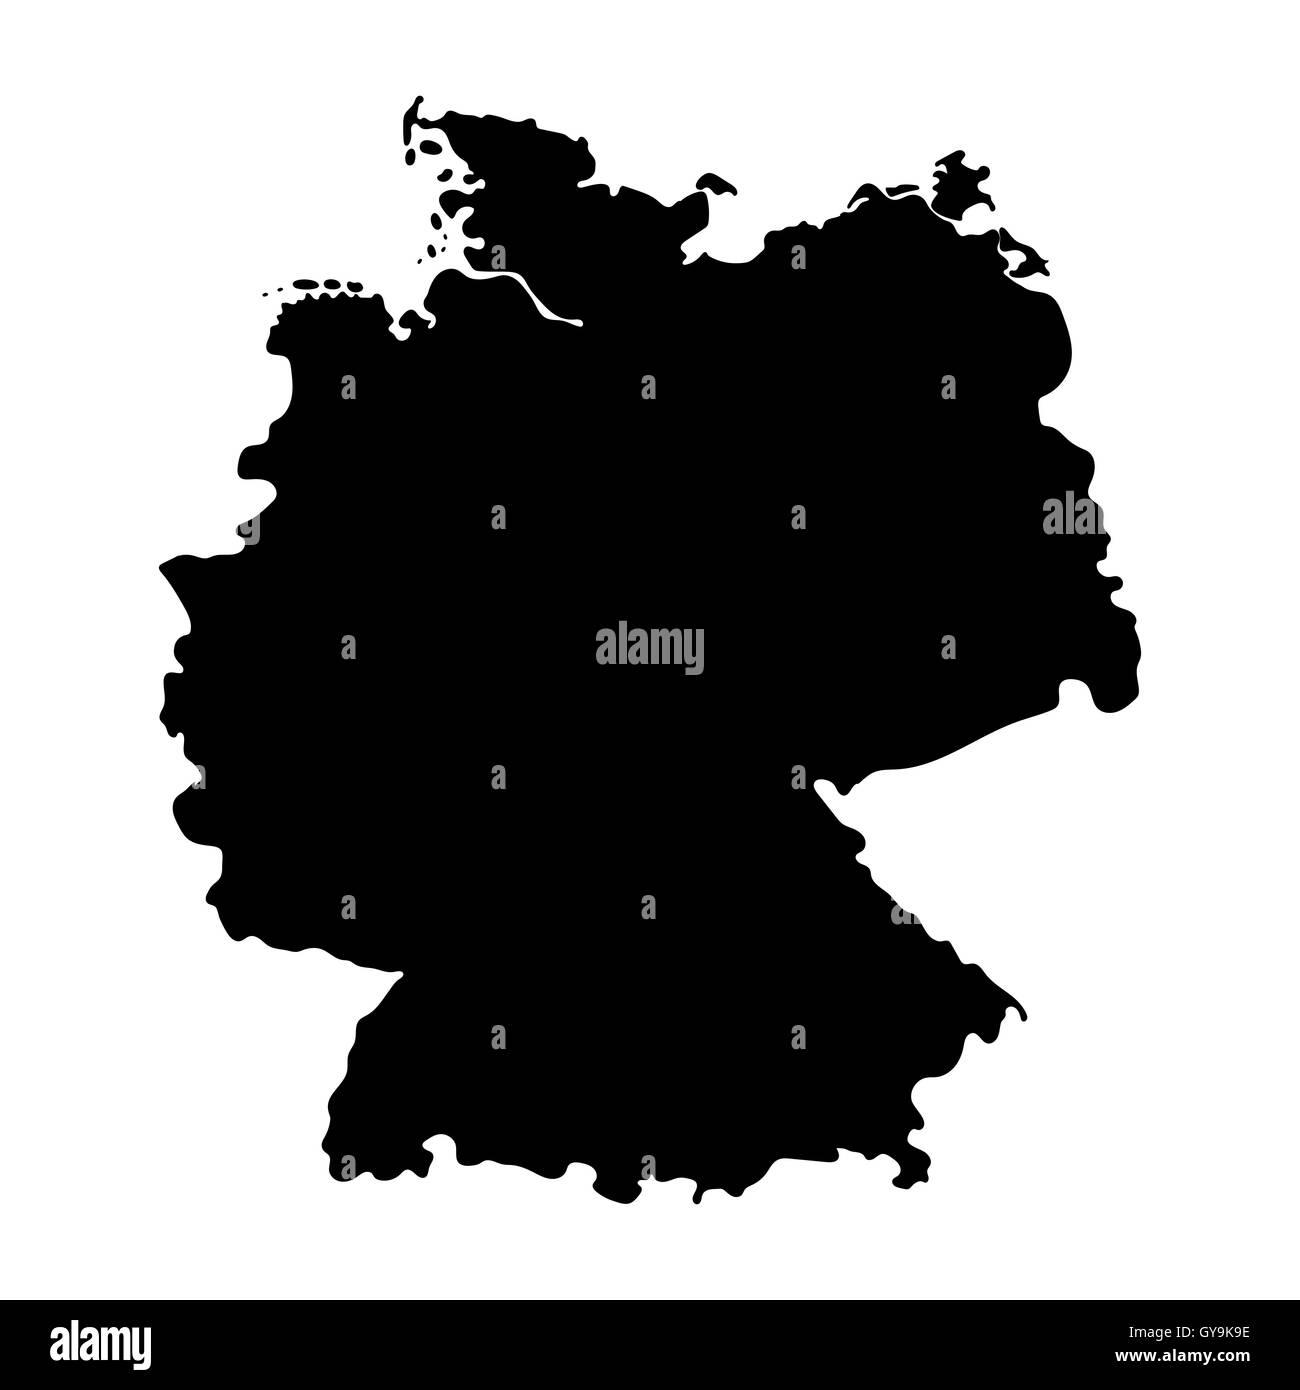 Map of Germany isolated on white background - Stock Image